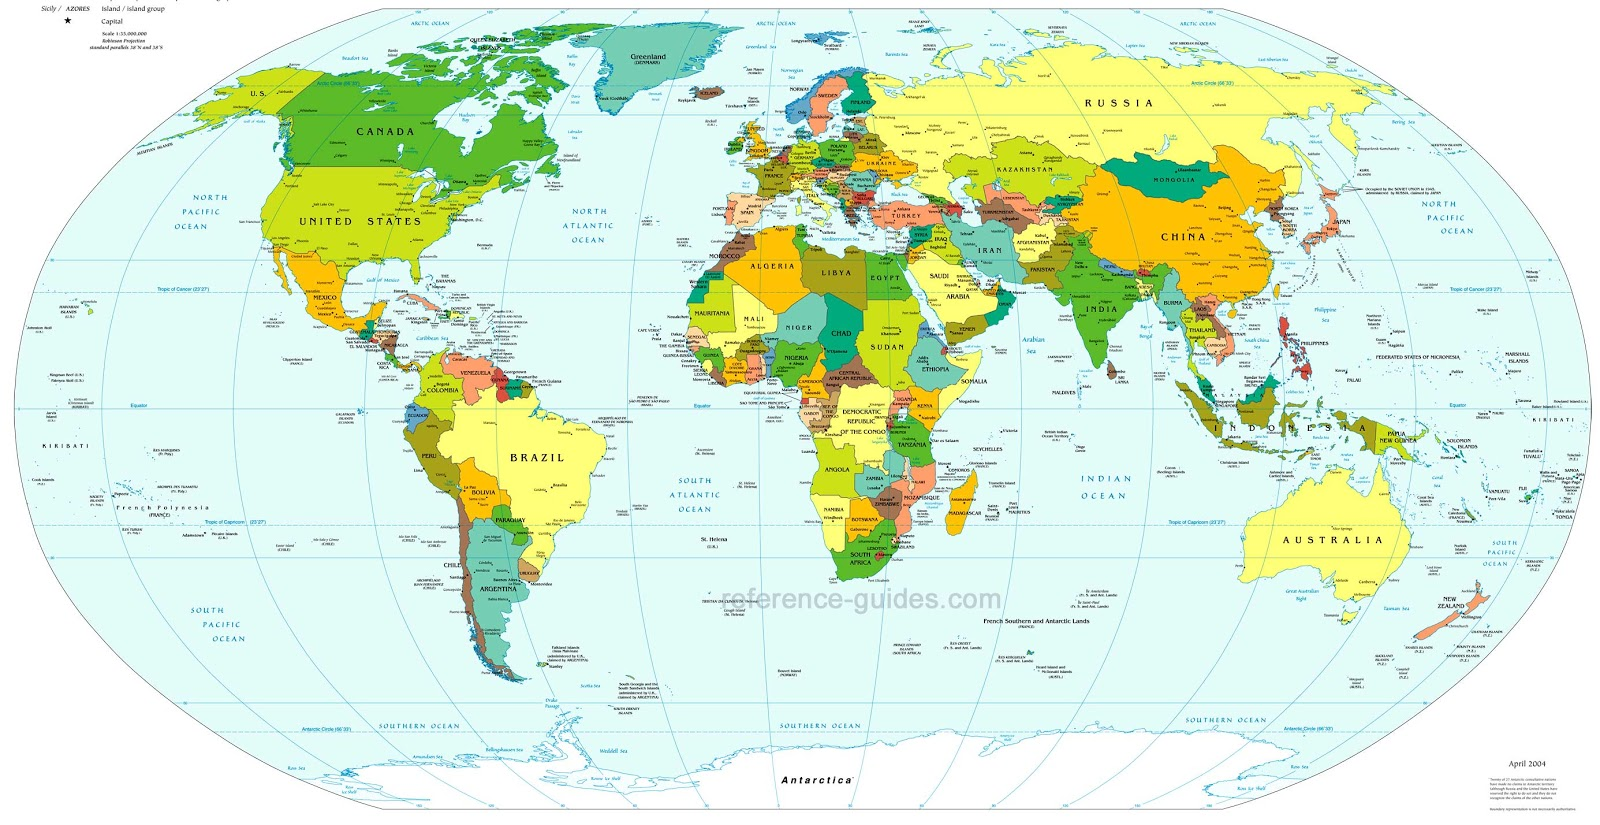 World map image in marathi civil service exam materials september 2013 gumiabroncs Images